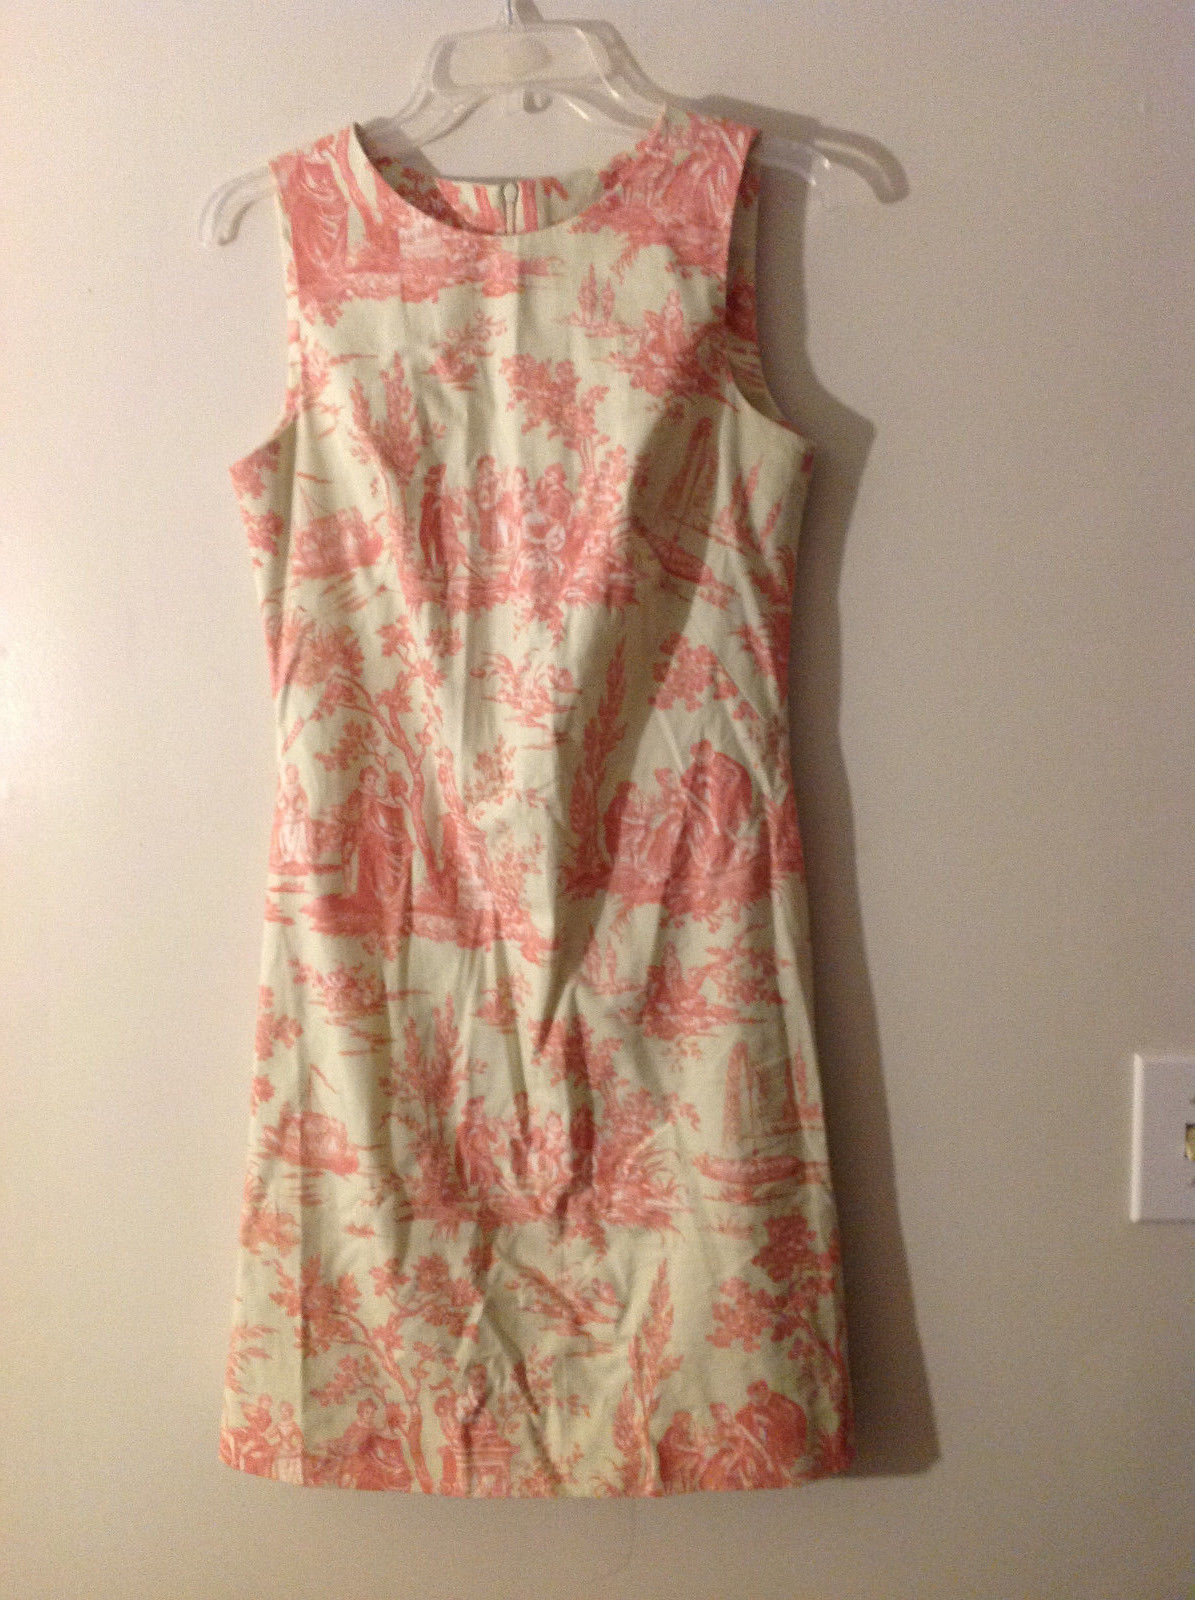 No Tag Women Size S Sleeveless Dress Sheath Pale Yellow Green Pink Novelty Print